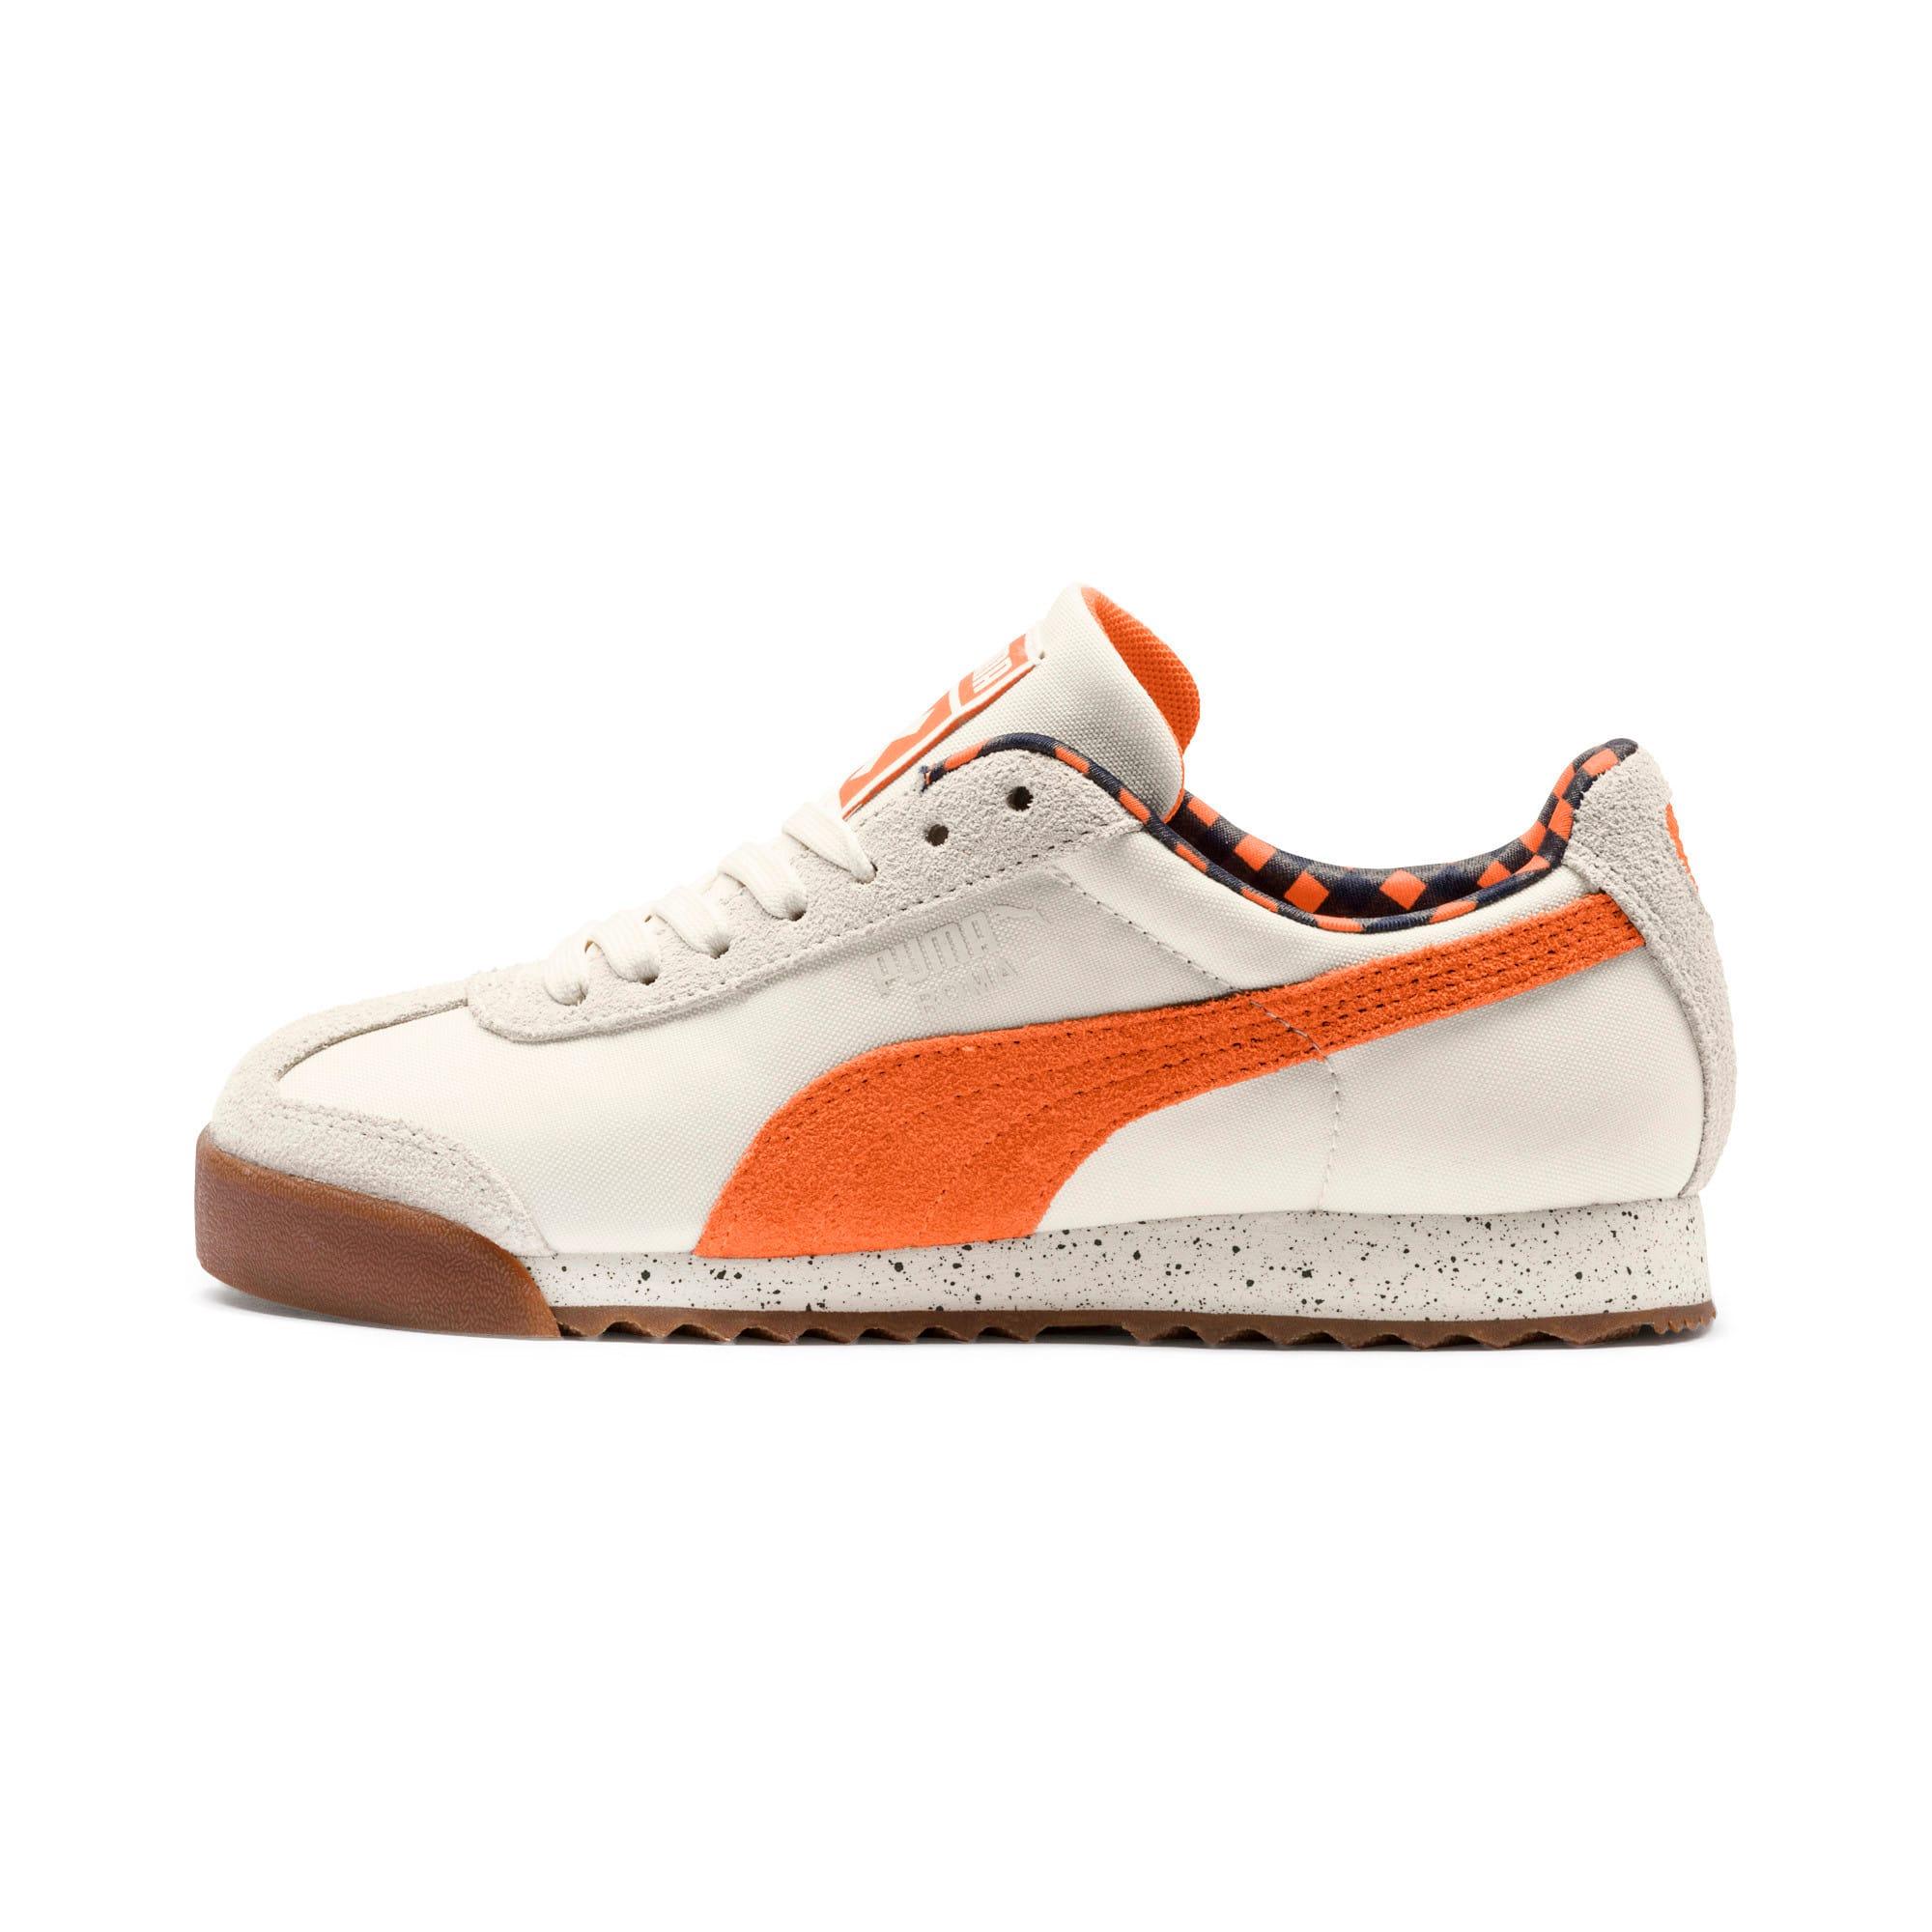 Thumbnail 1 of PUMA X TINYCOTTONS Roma Sneakers JR, White Asparagus-Orange-Blue, medium